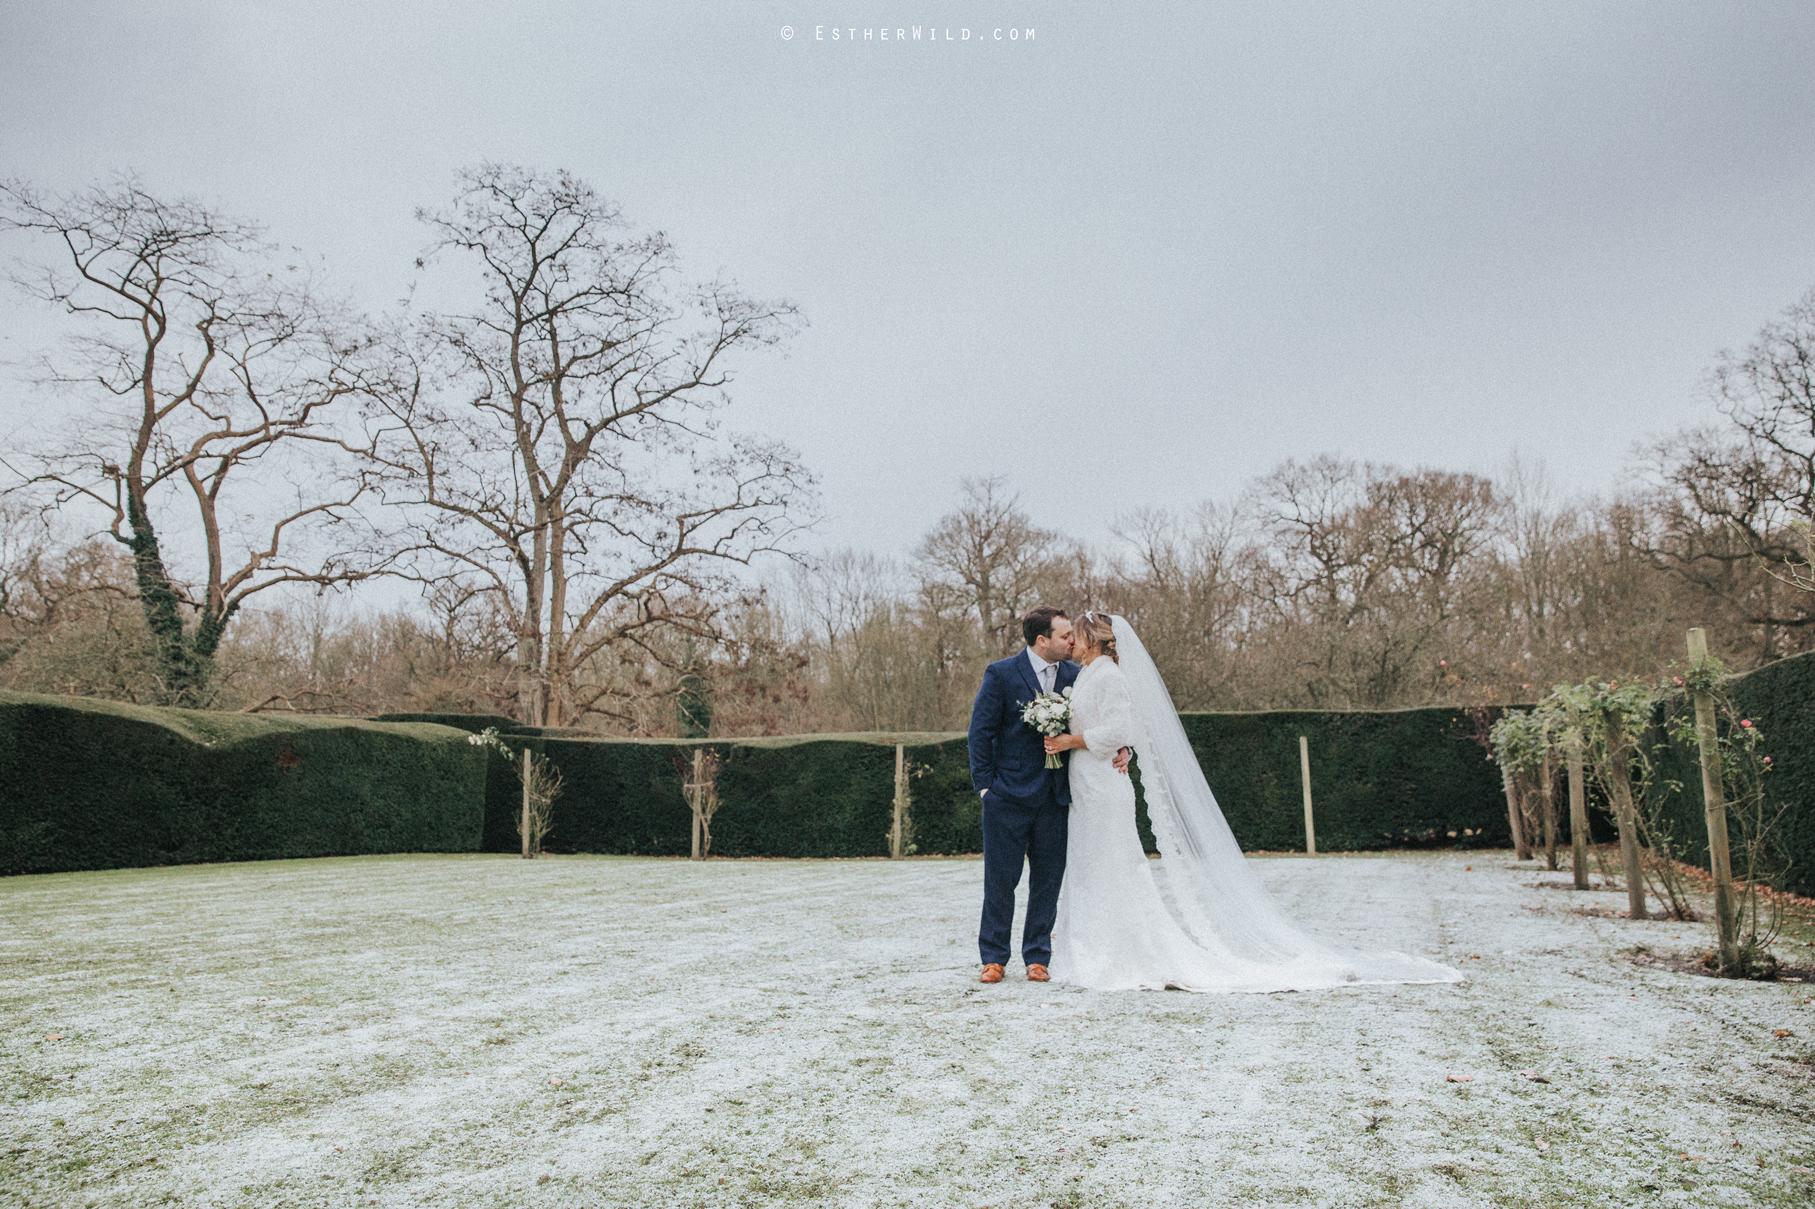 Wedding_Photography_Diss_Gawdy_Hall_Redenhall_Church_Norfolk_Winter_Esther_Wild_Copyright_IMG_1791.jpg